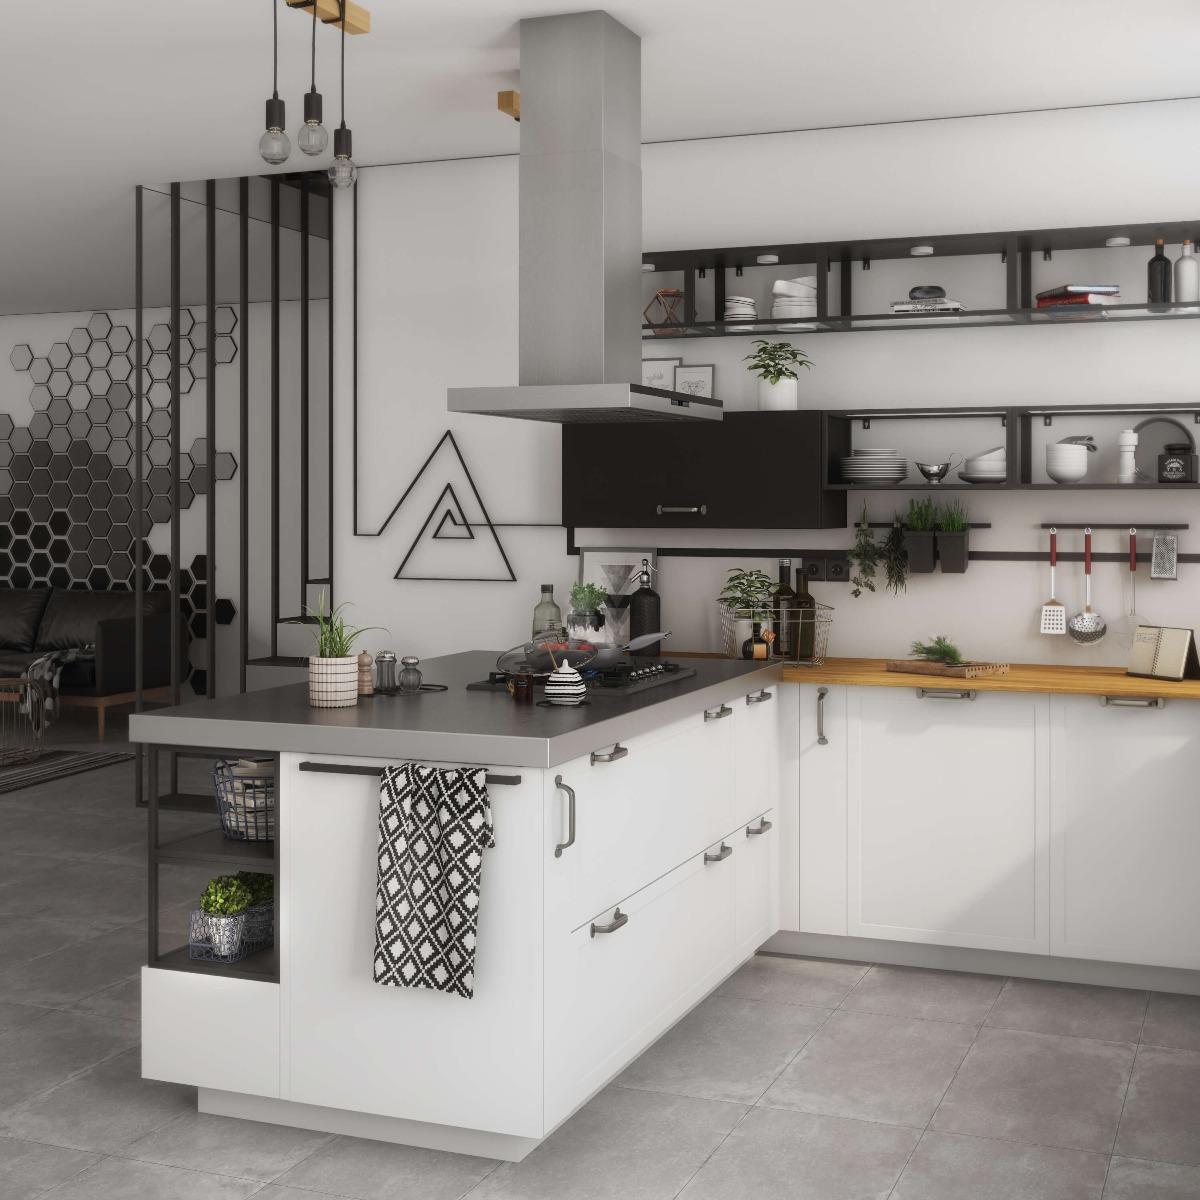 Delinia Newport White Designer Kitchen Mobi - Example 4